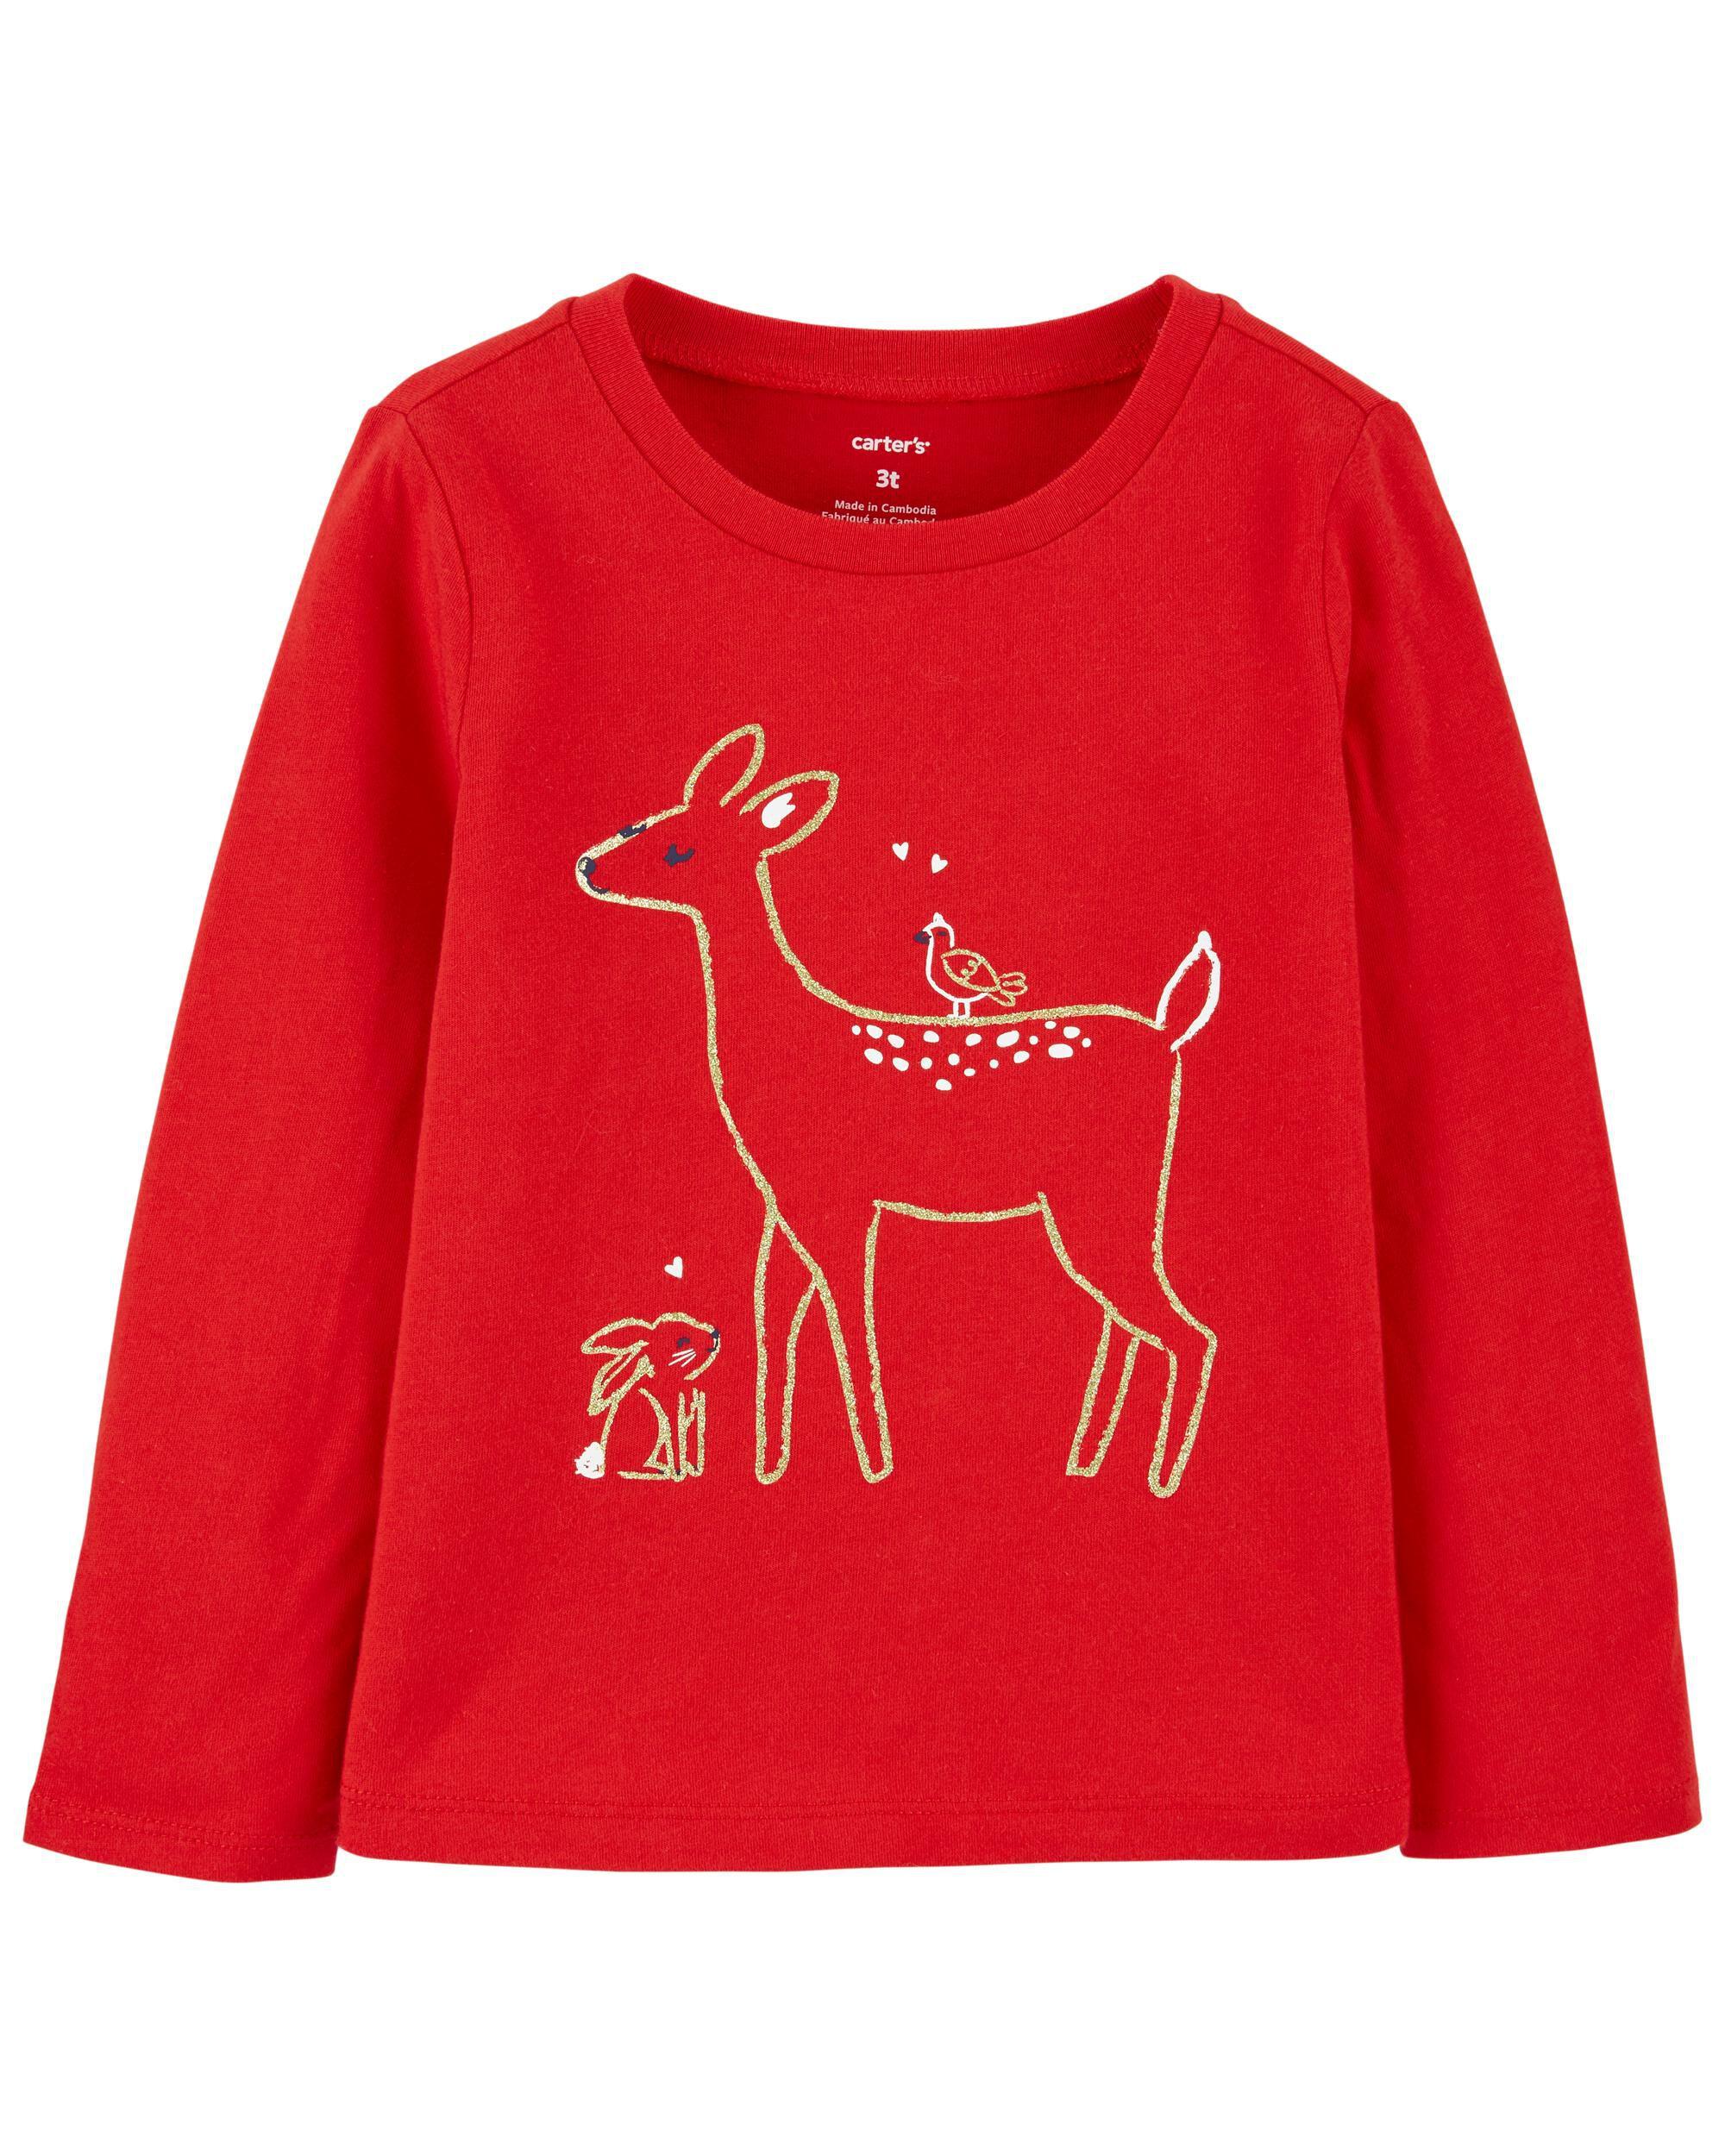 *CLEARANCE* Reindeer Jersey Tee